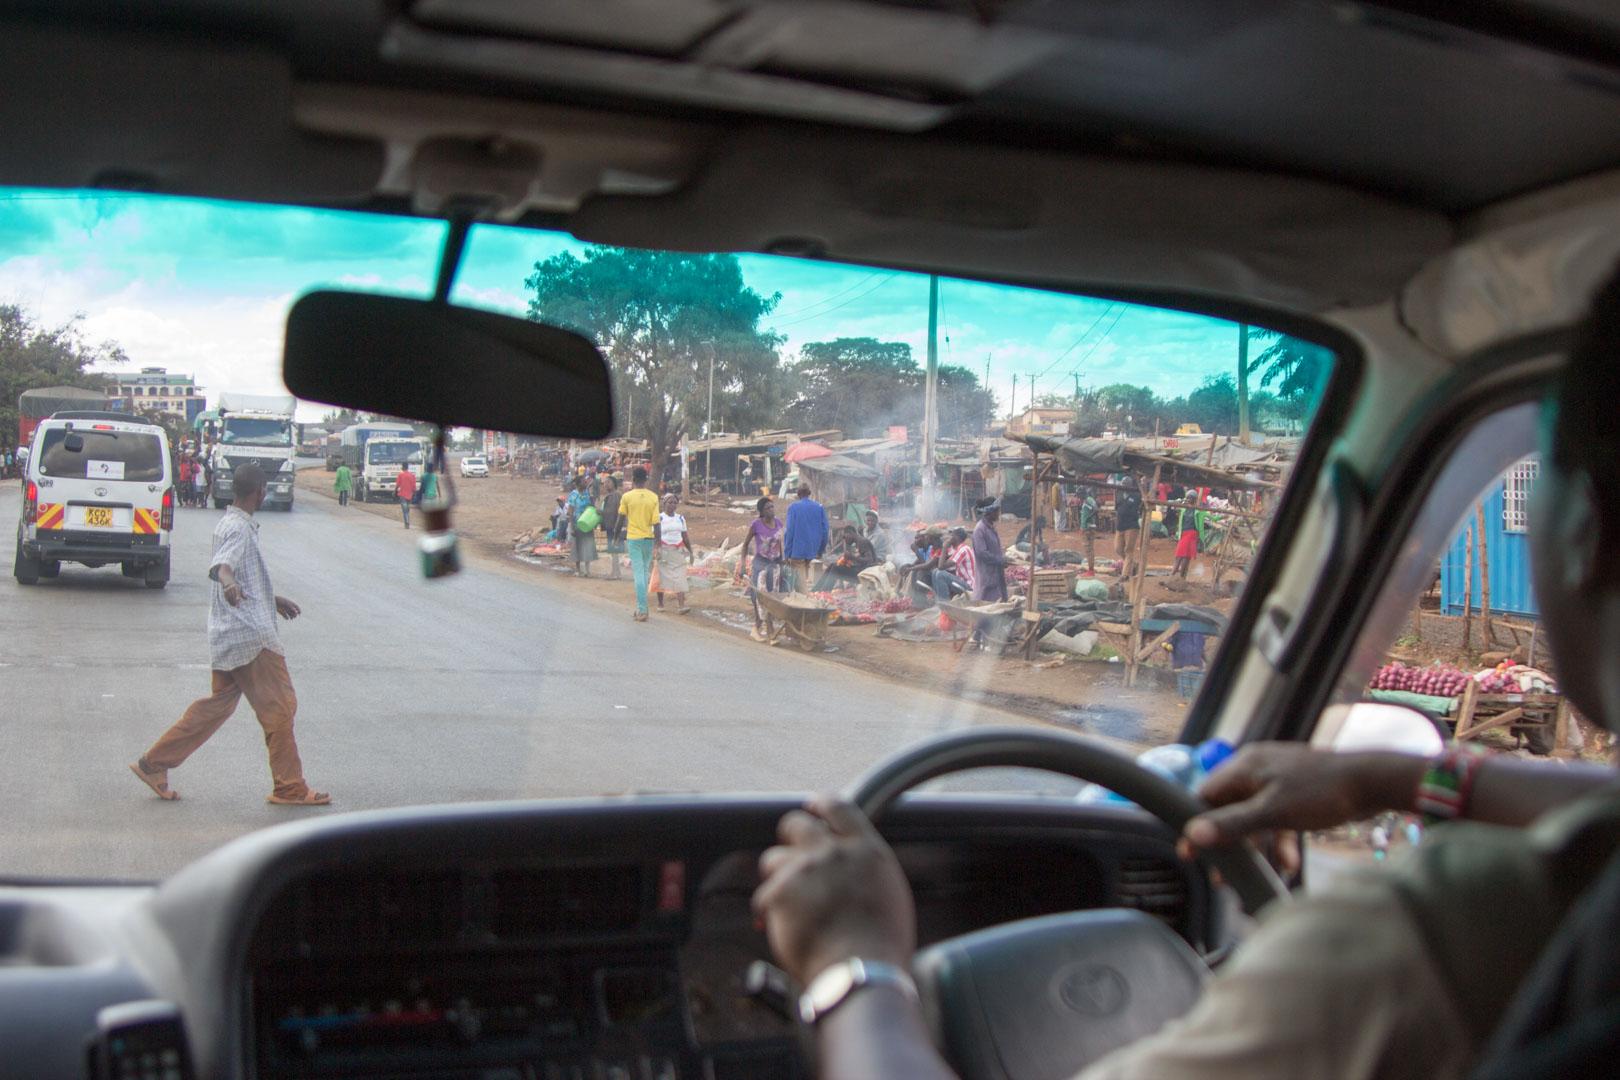 Pueblo en la carretera de Nairobi a Amboseli, Kenia